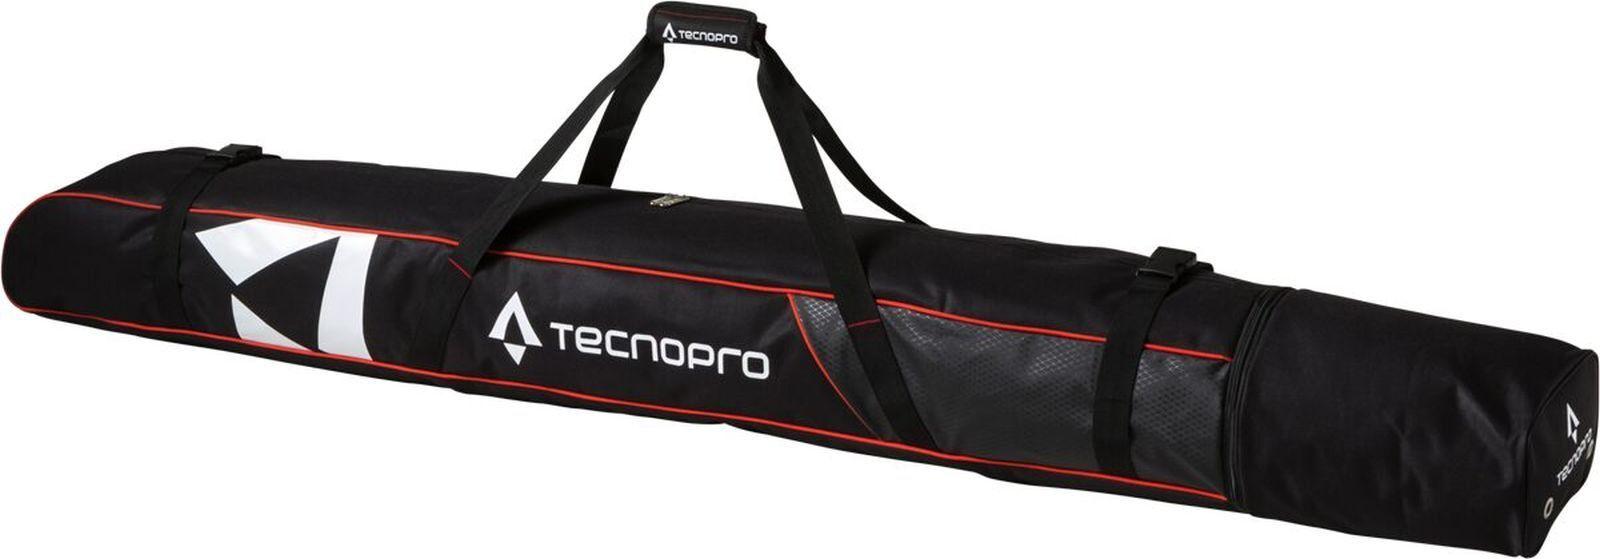 Tecno Pro Skisack Skitasche Cover Carving für 2Paar Ski schwarz / rot